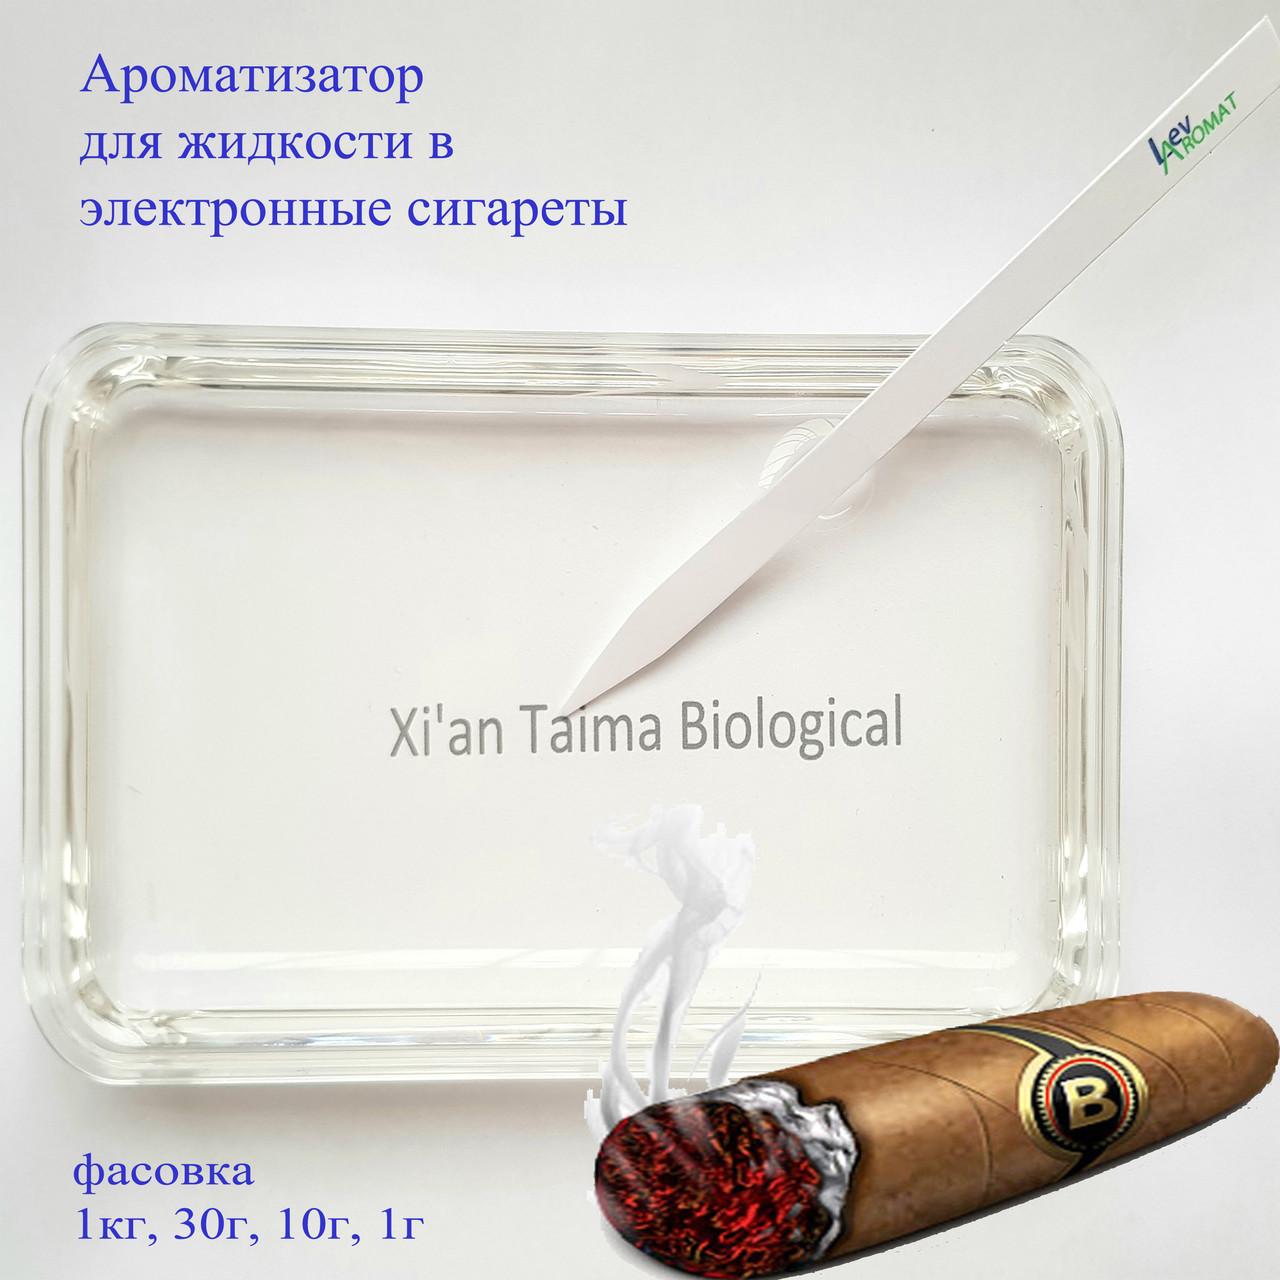 Ароматизатор Сигар-персик  (Sigar Peach  ) компонент для самозамеса